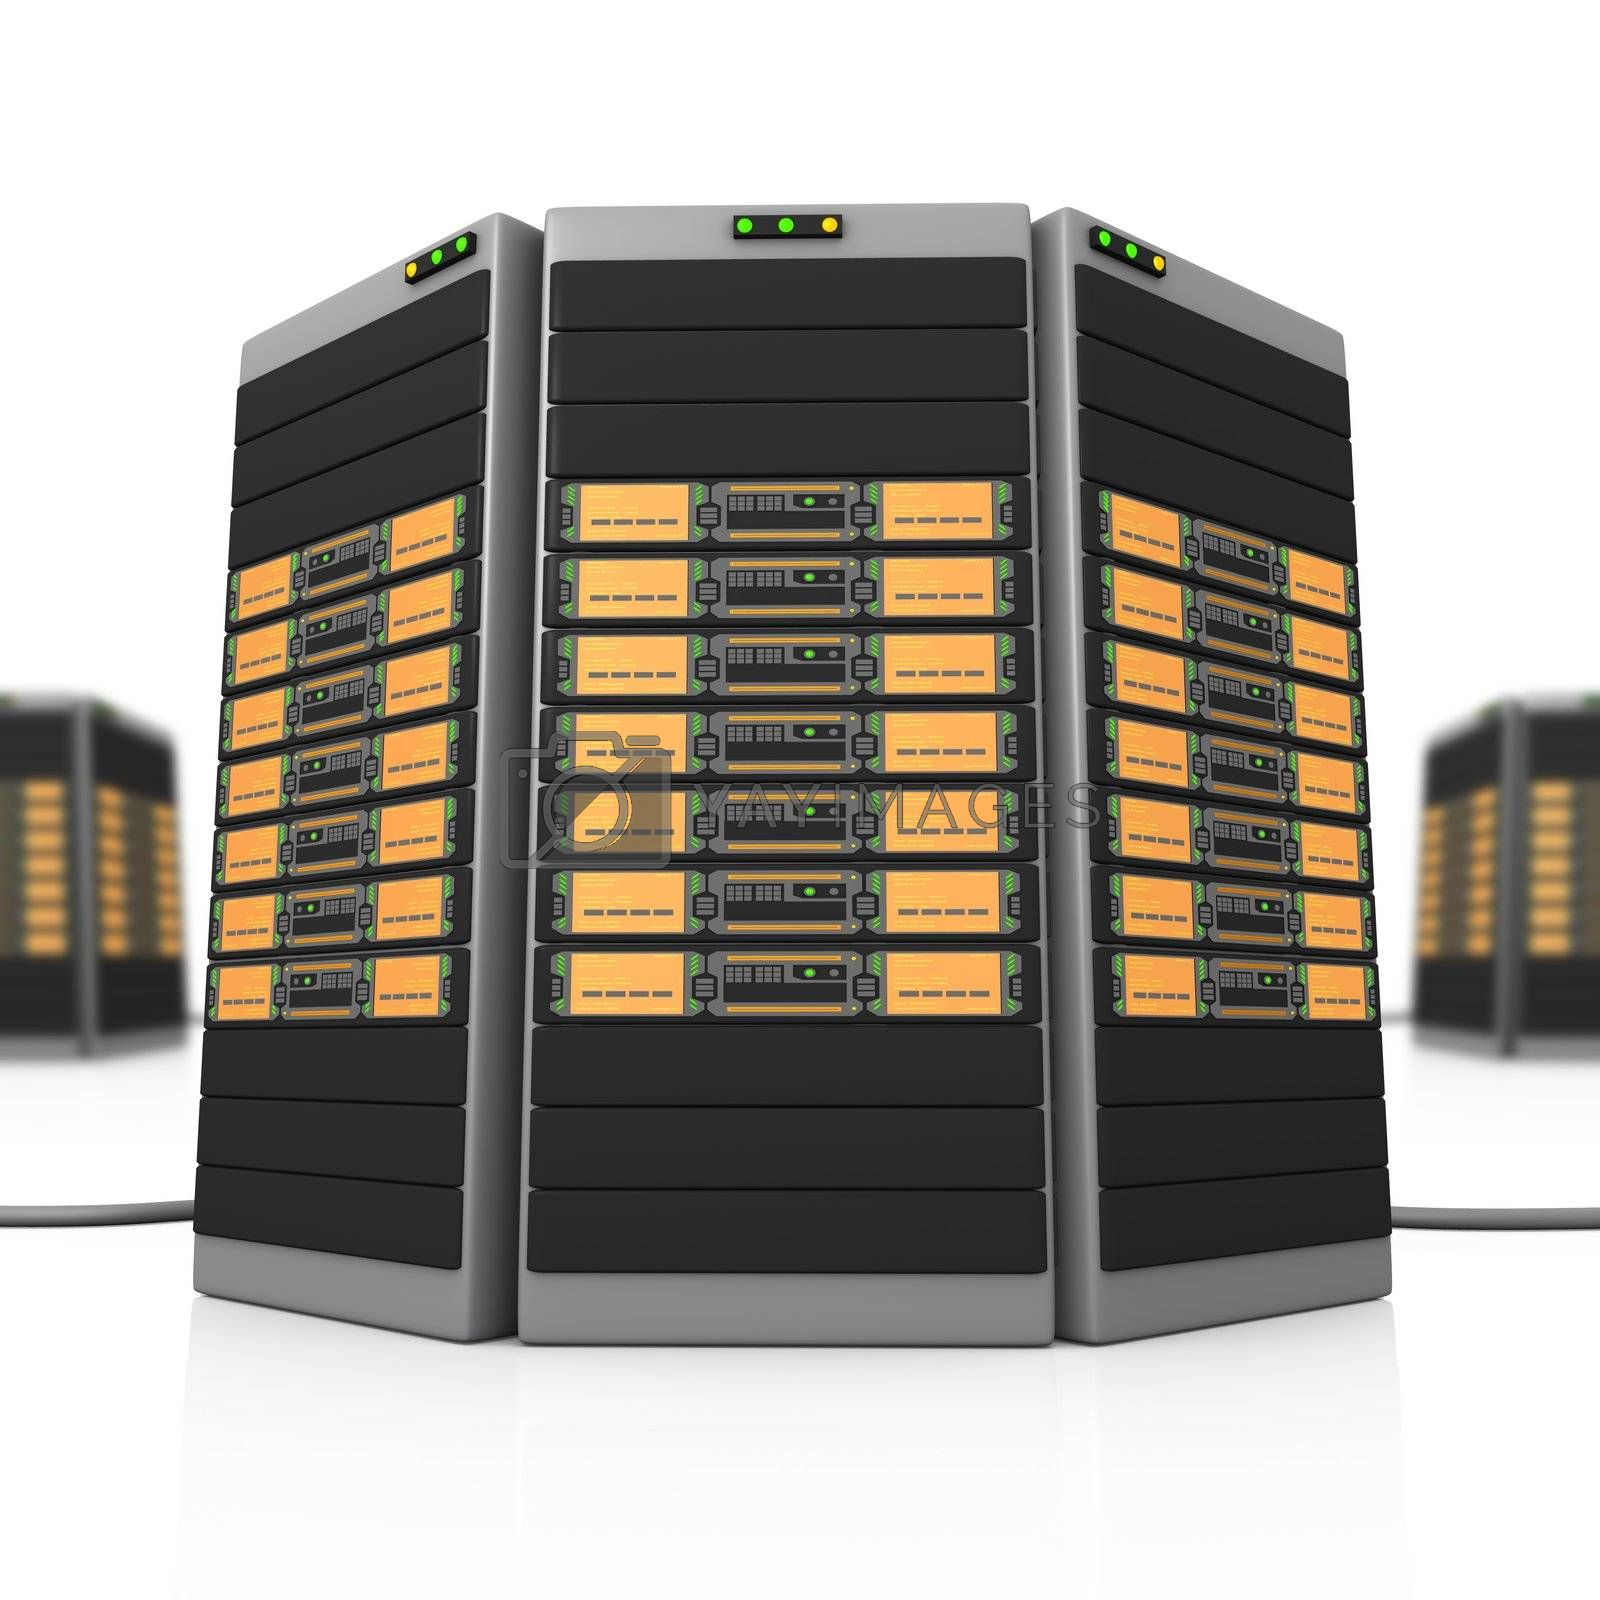 3D Servers by 3pod